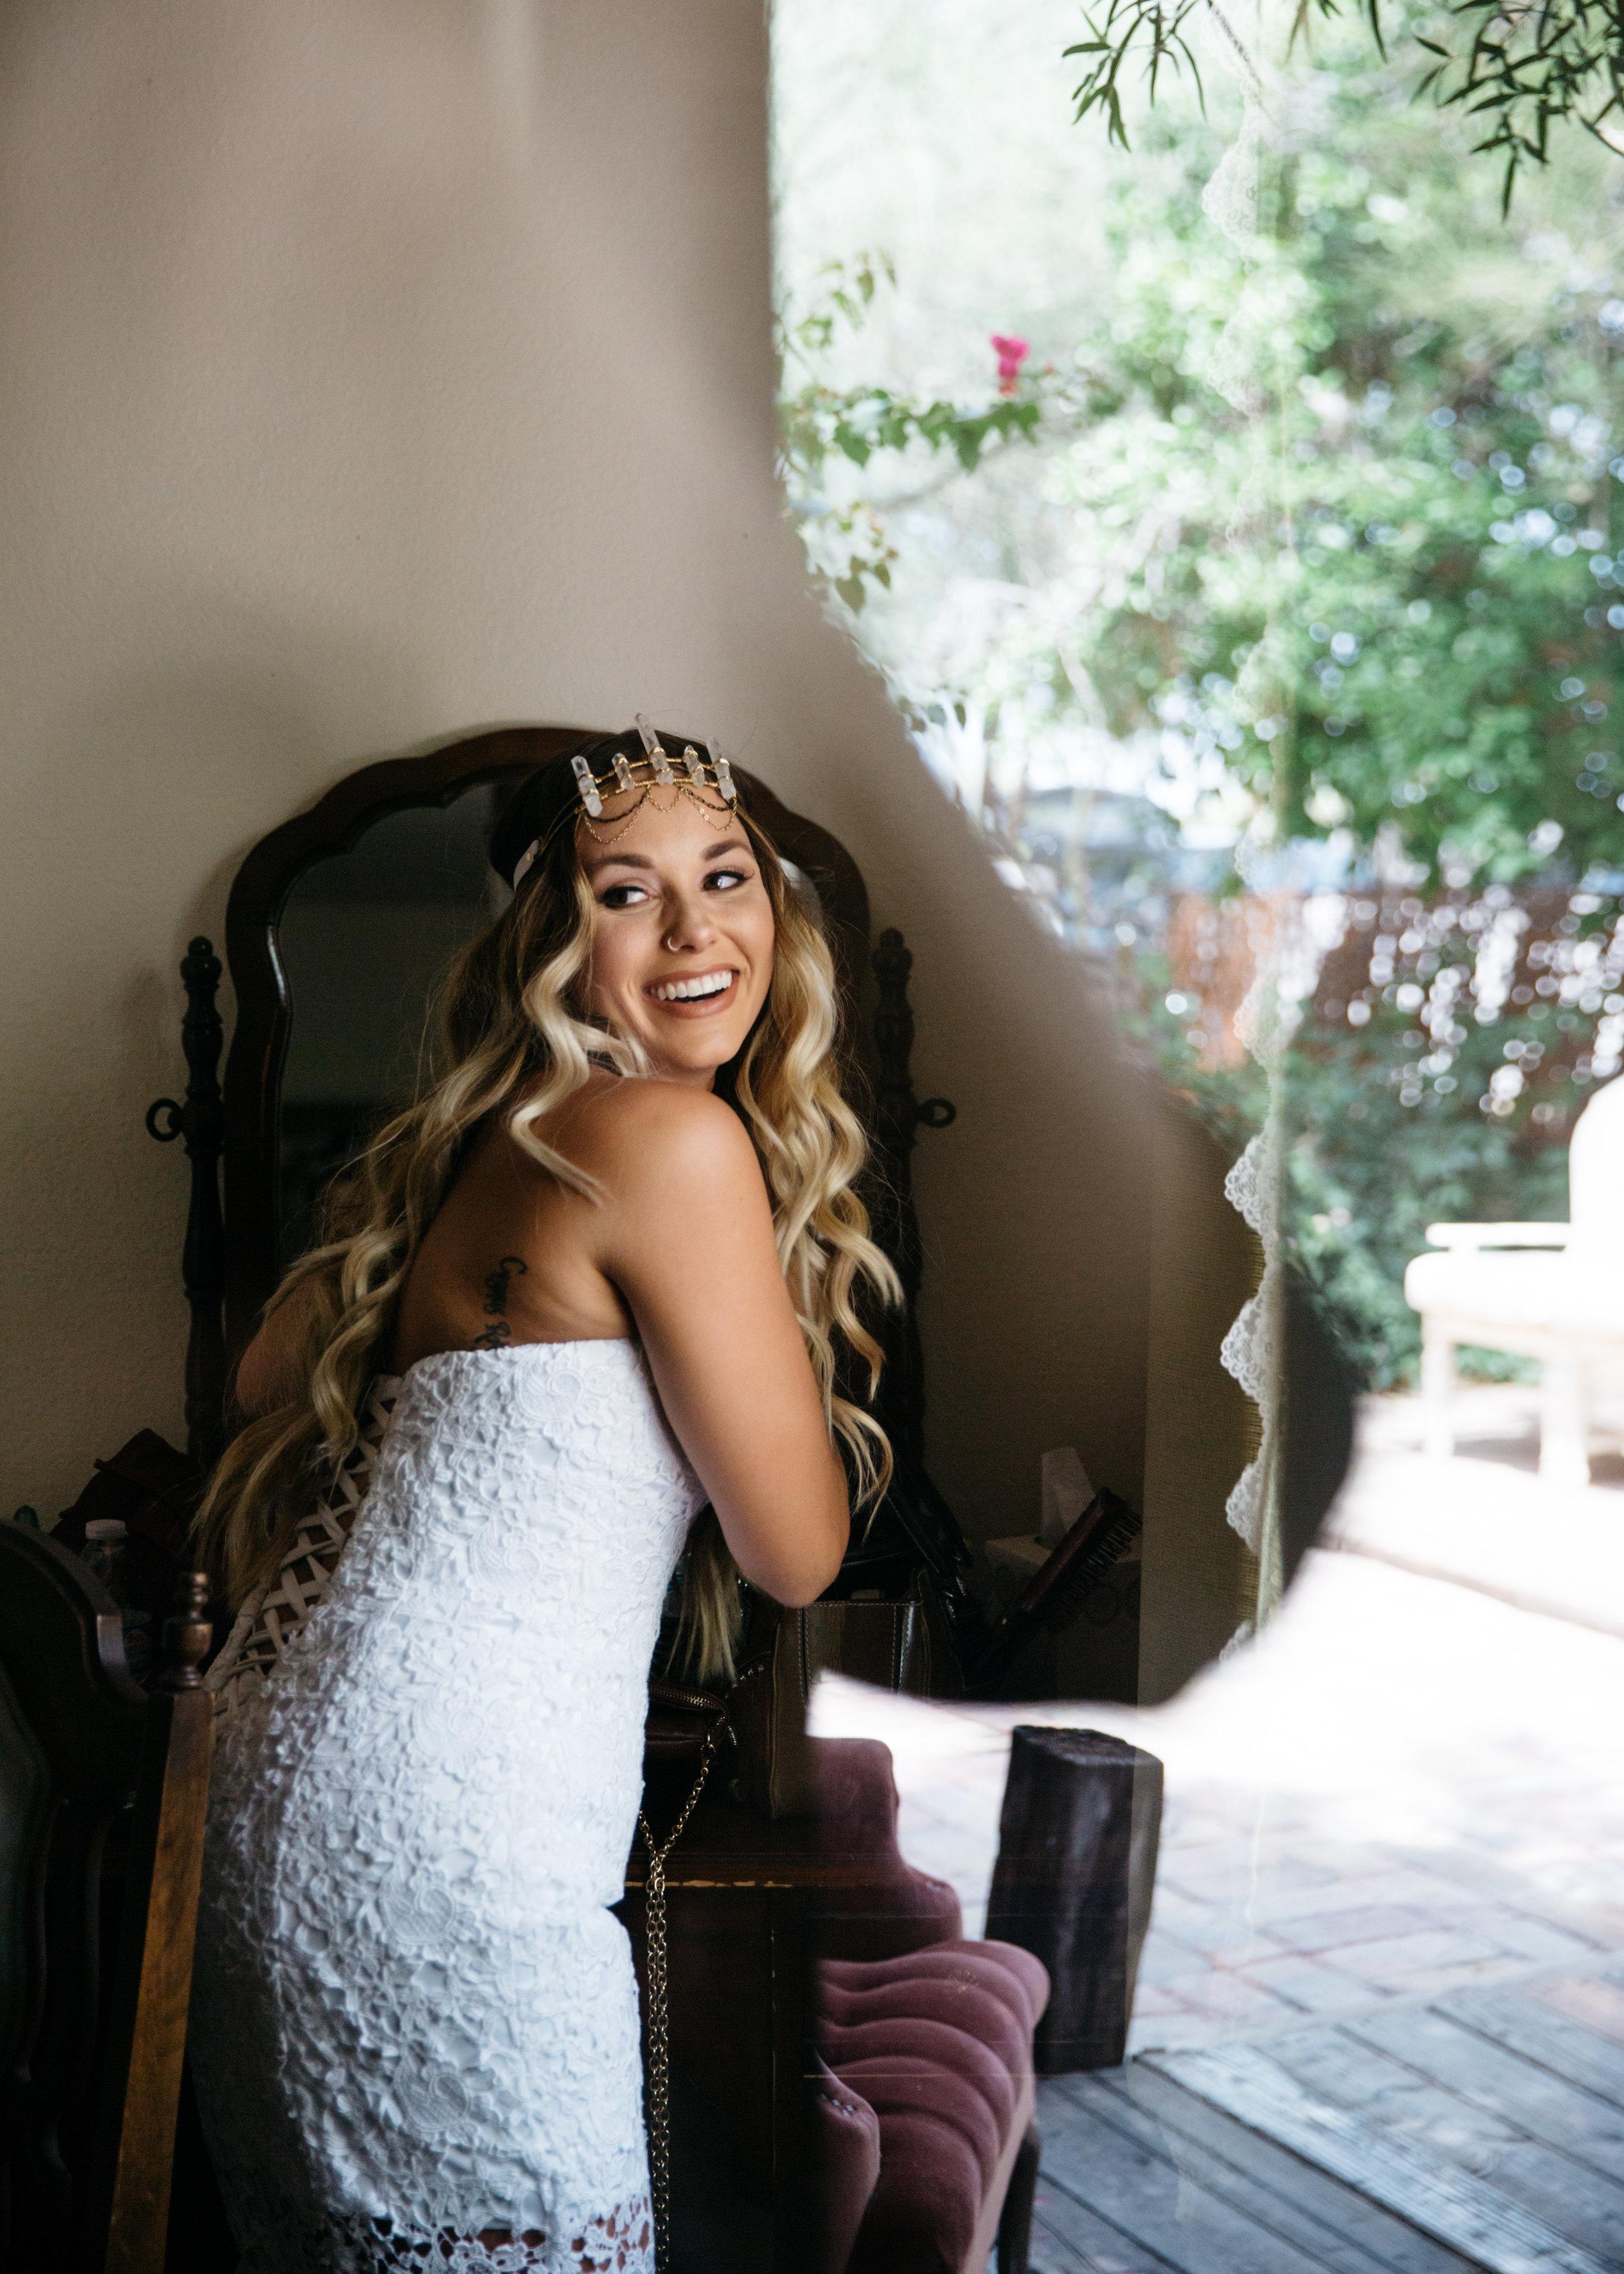 colorado-springs-wedding-photographer-6.jpg